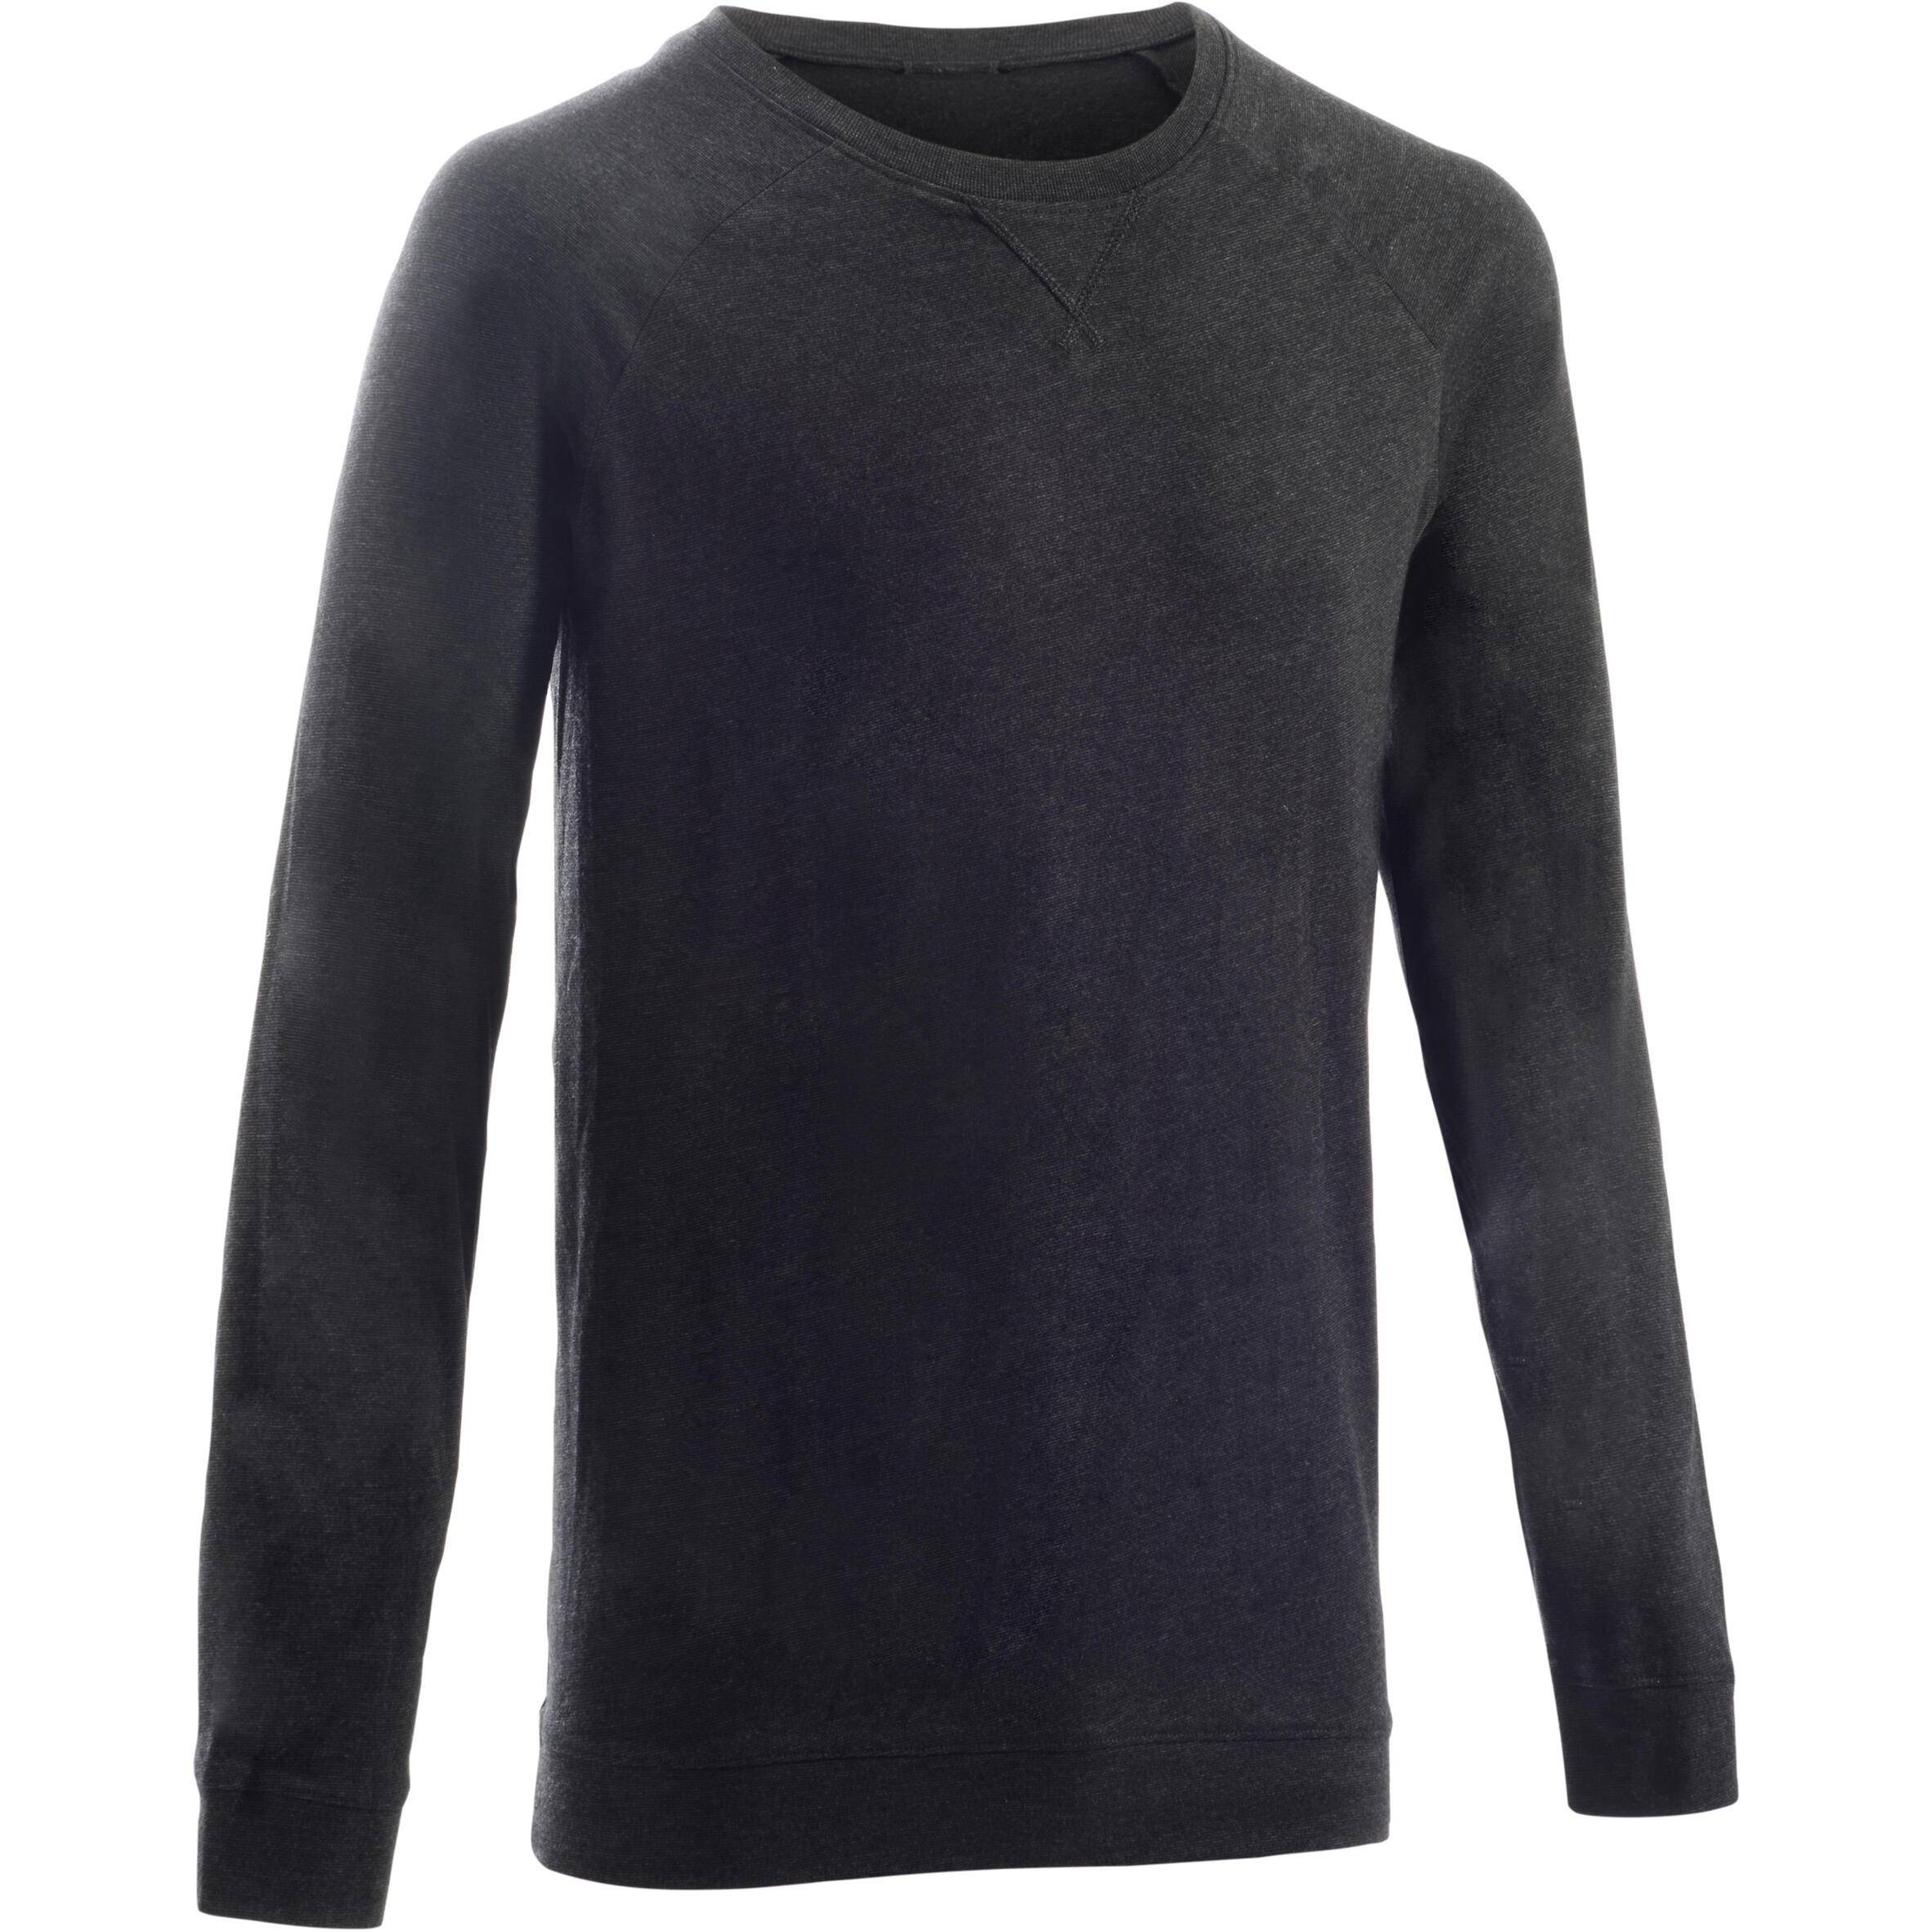 Domyos Herensweater 100 voor gym en stretching donkergrijs